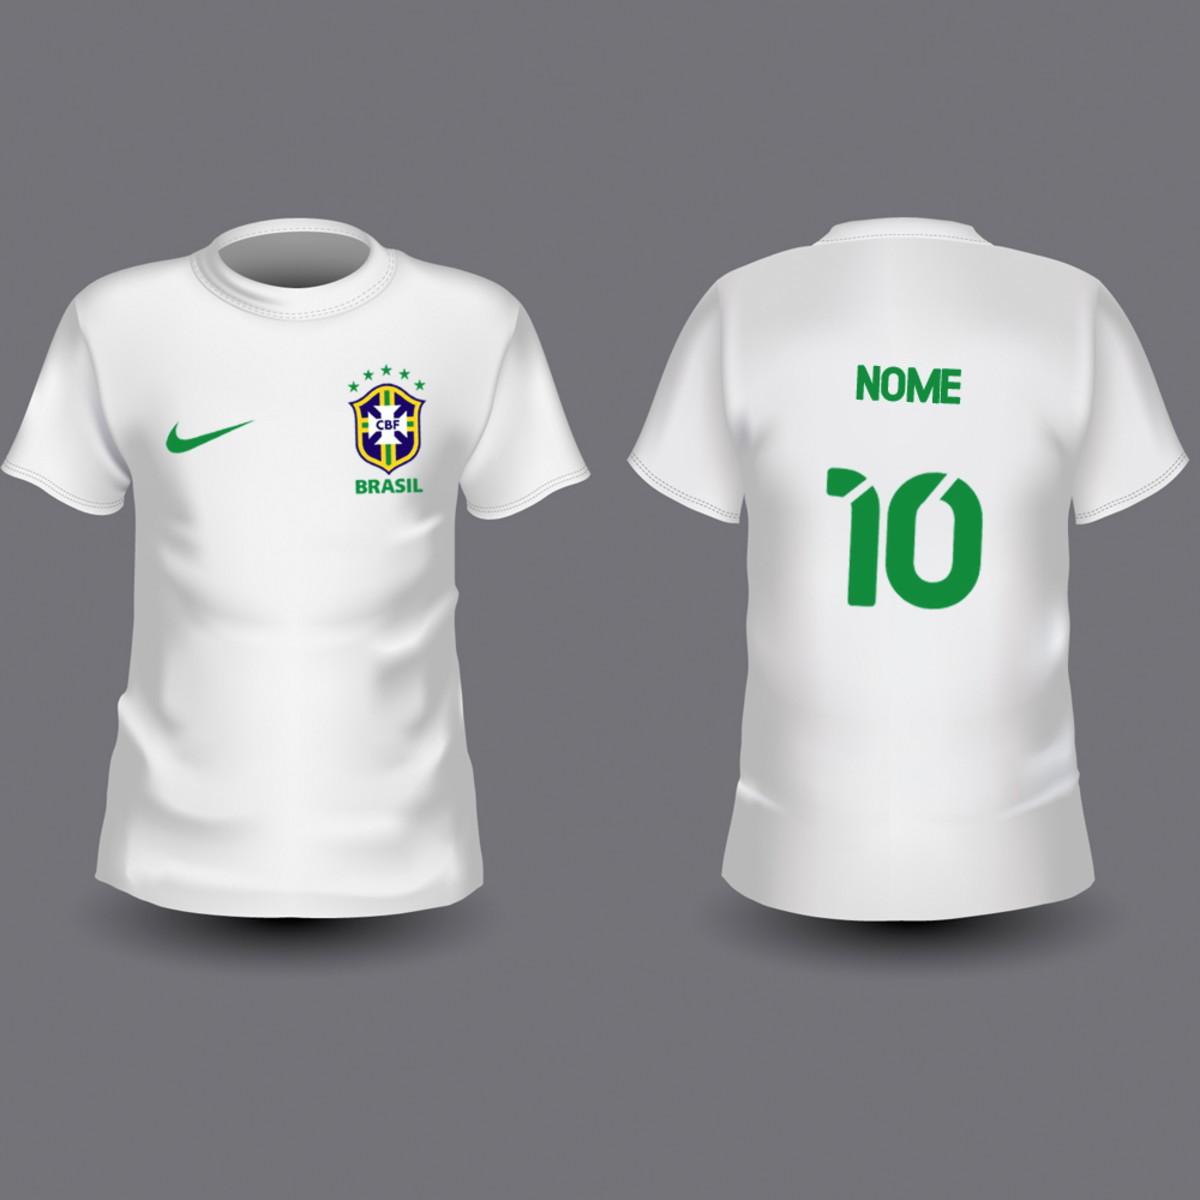 Camiseta Infantil Brasil Personalizada no Elo7  b1b73b3f7062a